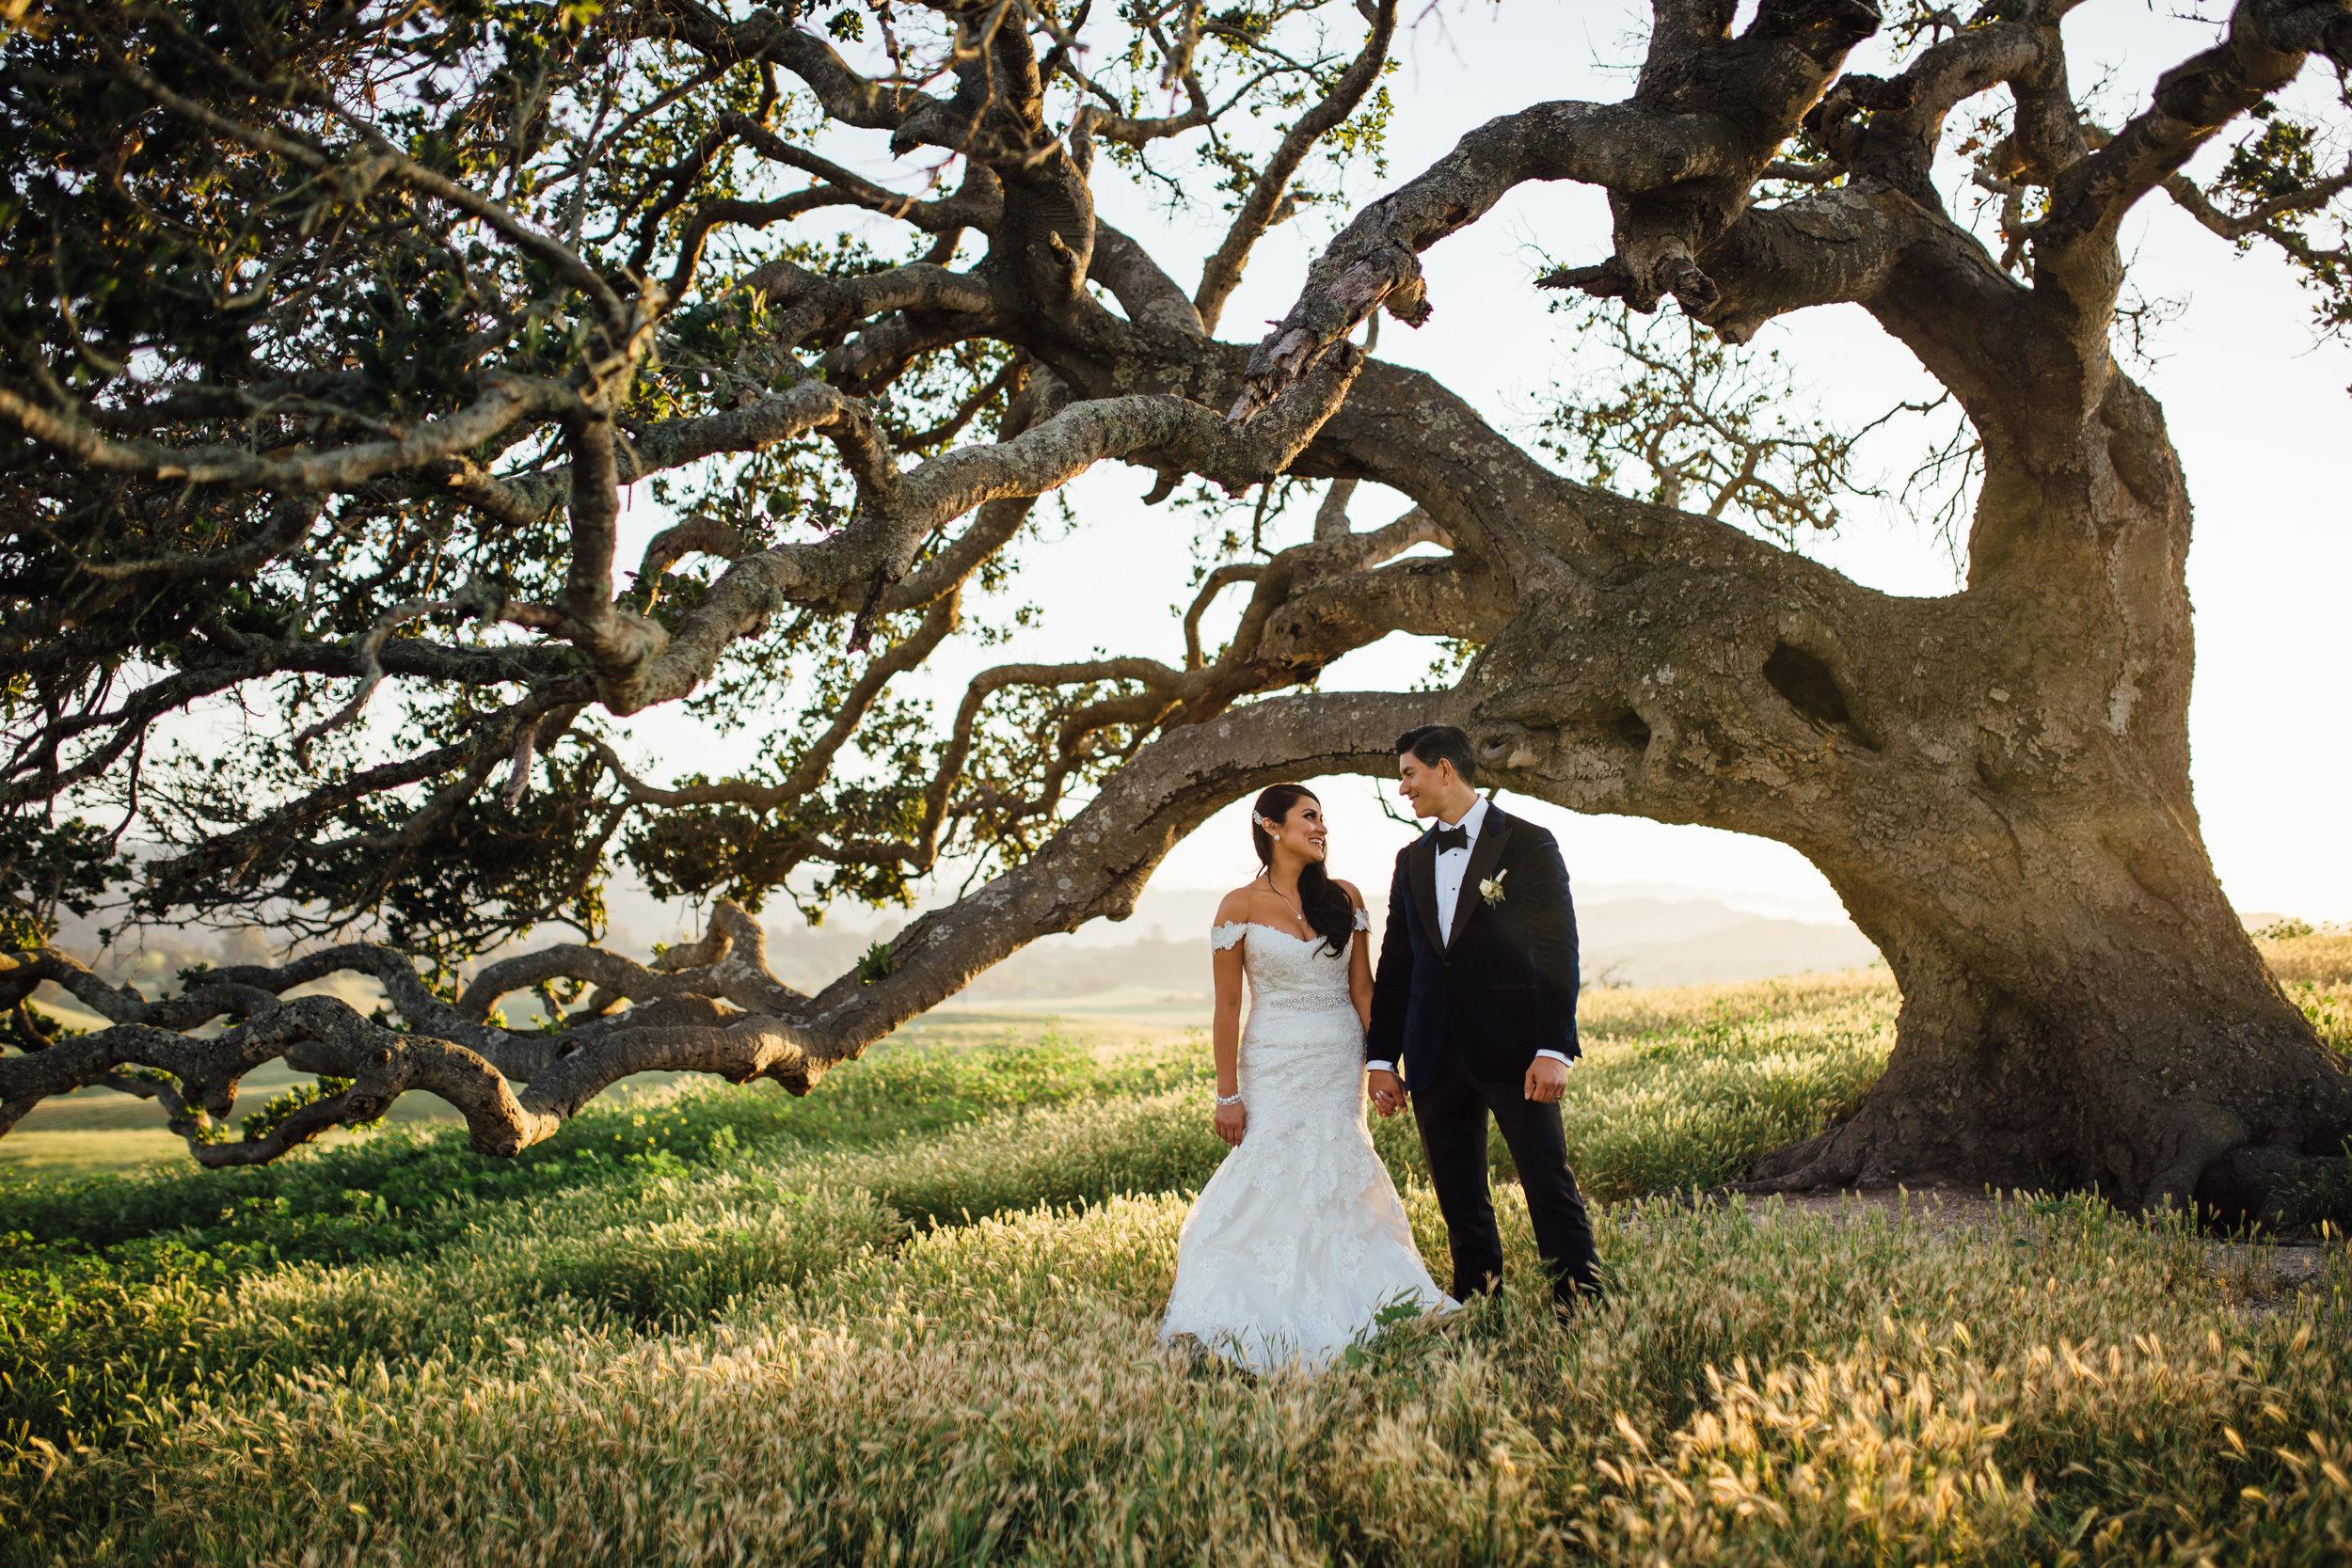 www.santabarbarawedding.com | Spreafico Farms | Hannah Kate Photography